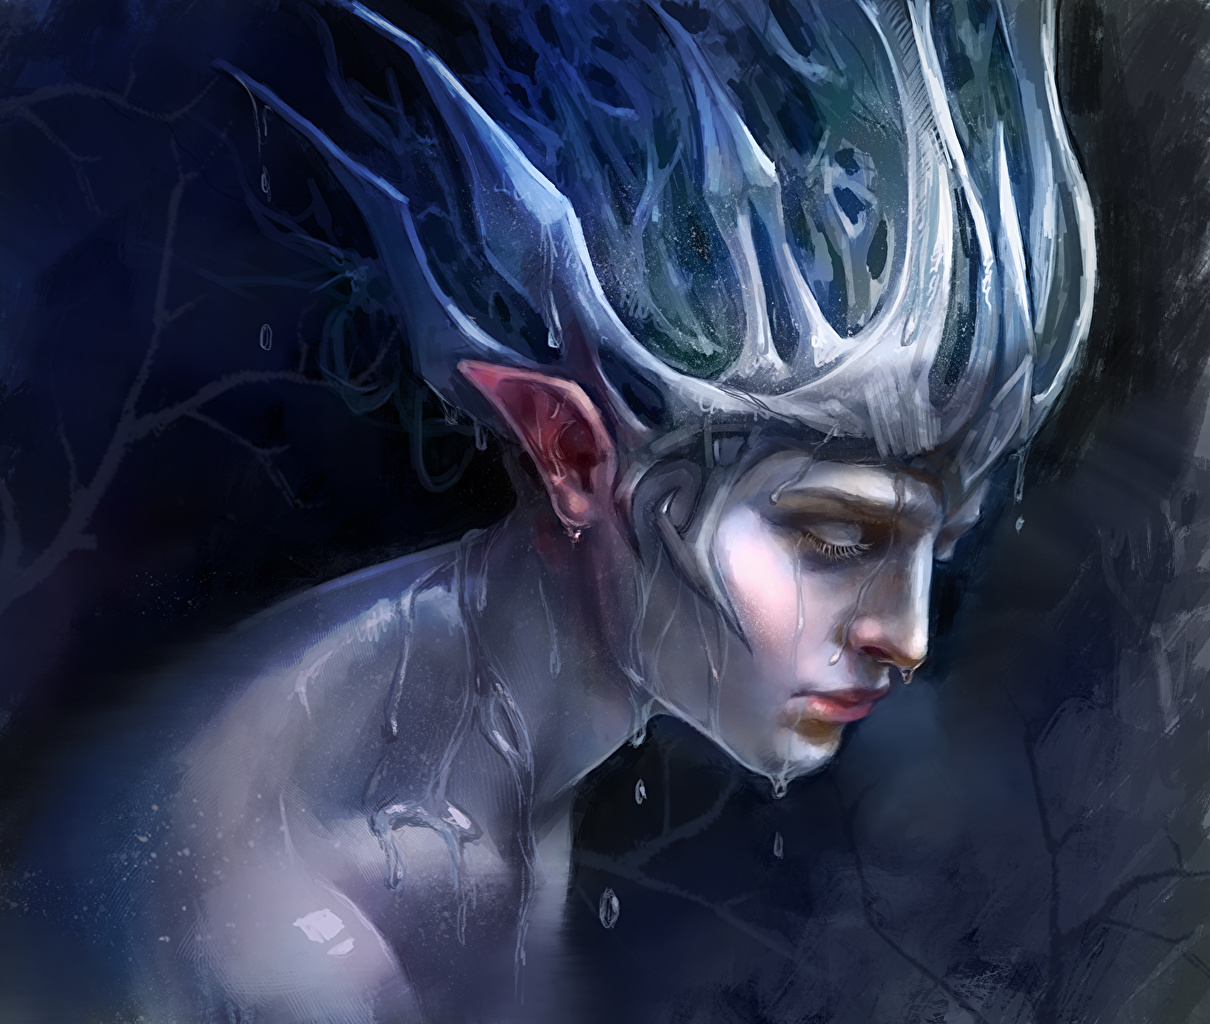 Image Fantasy Supernatural beings